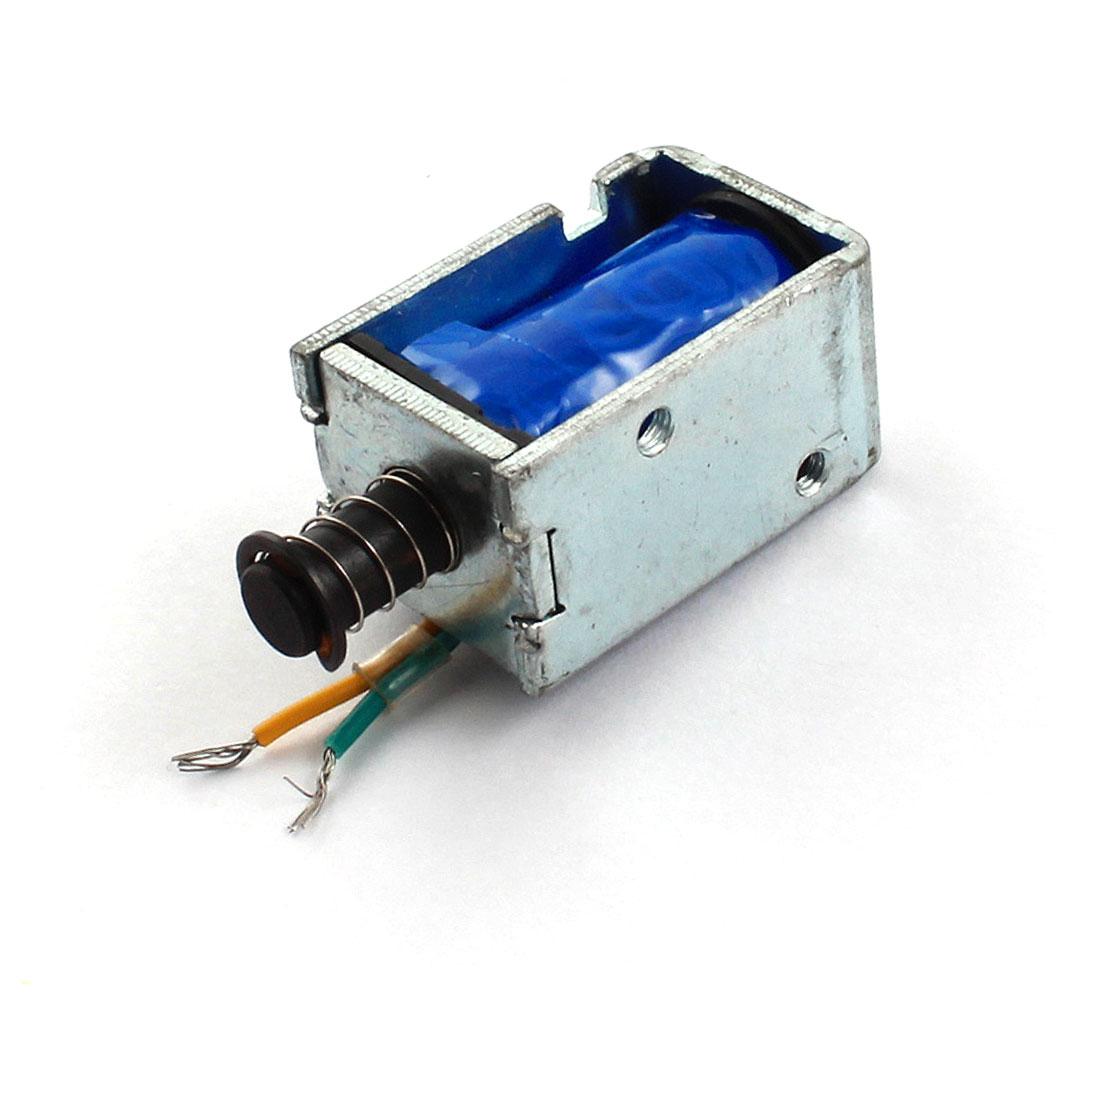 DC 12V 6mm Stroke 100g Force Open Frame Spring Plunger Linear Motion Push Pull Type Solenoid Electromagnet